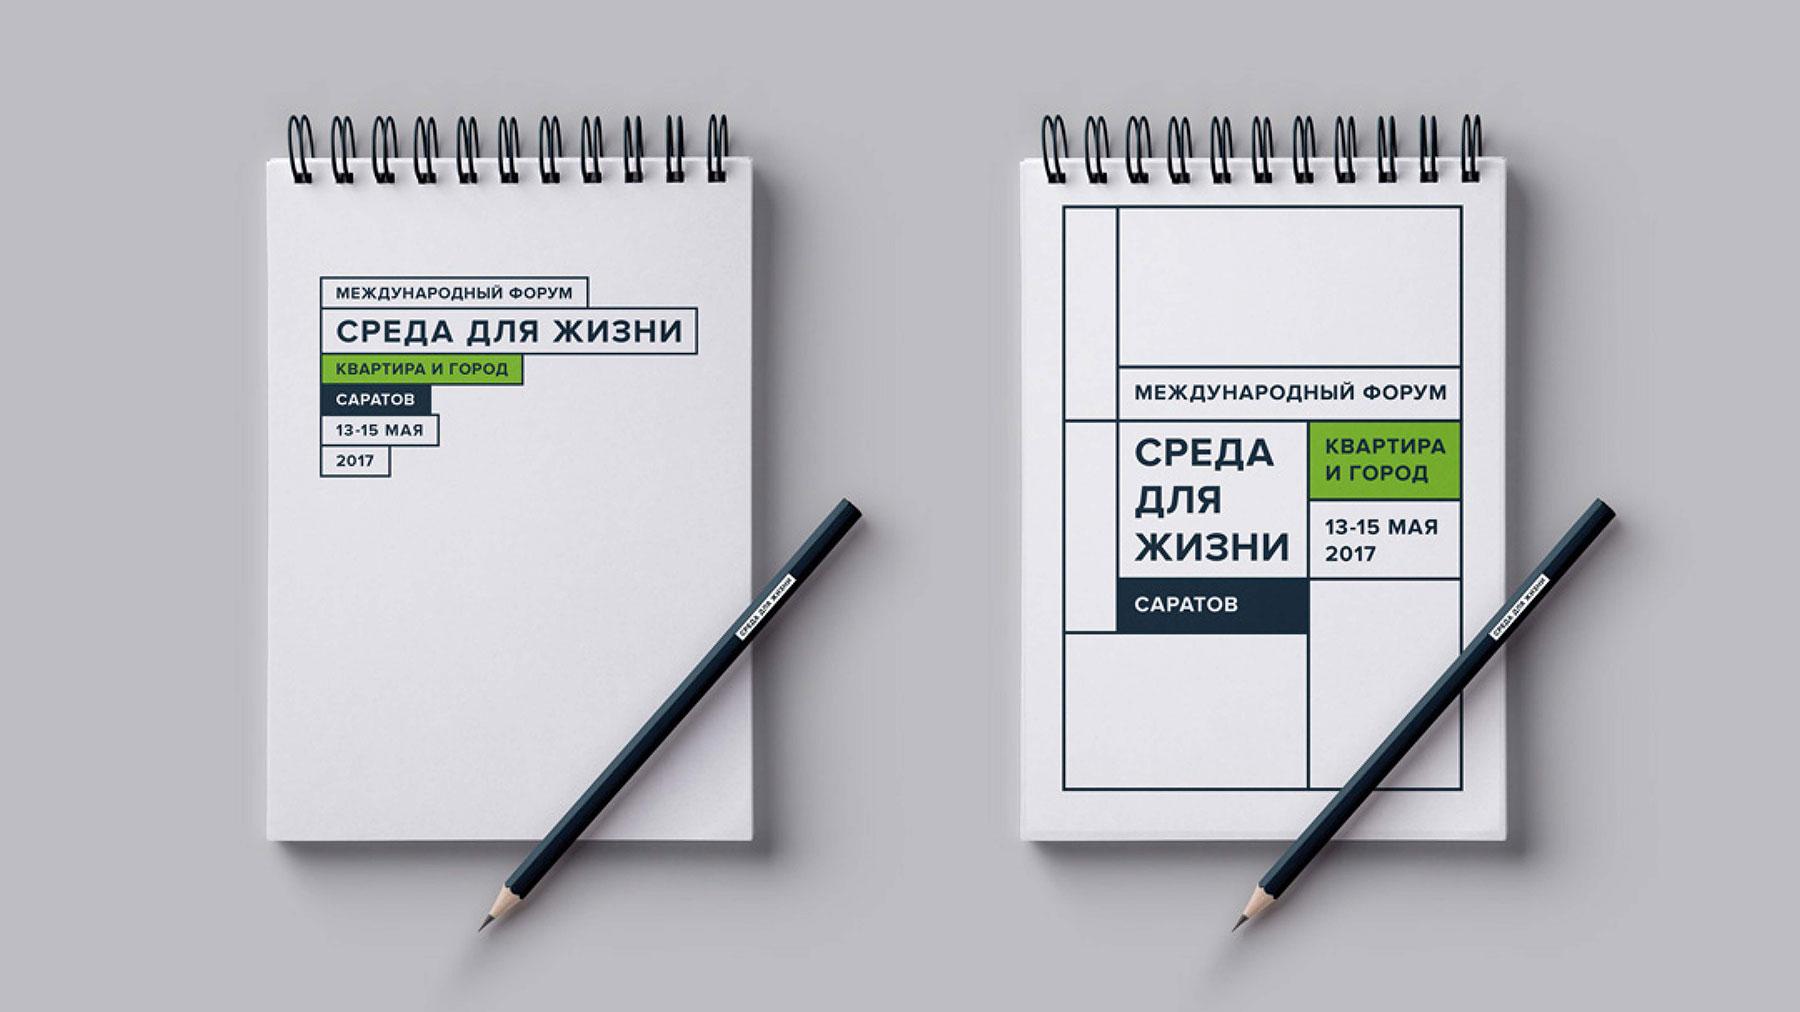 http://the-madmen.ru/wp-content/uploads/2019/Портфолио/Среда_для_жизни/P_TMM_SForum_Logo_170217_v4_Page_07.jpg